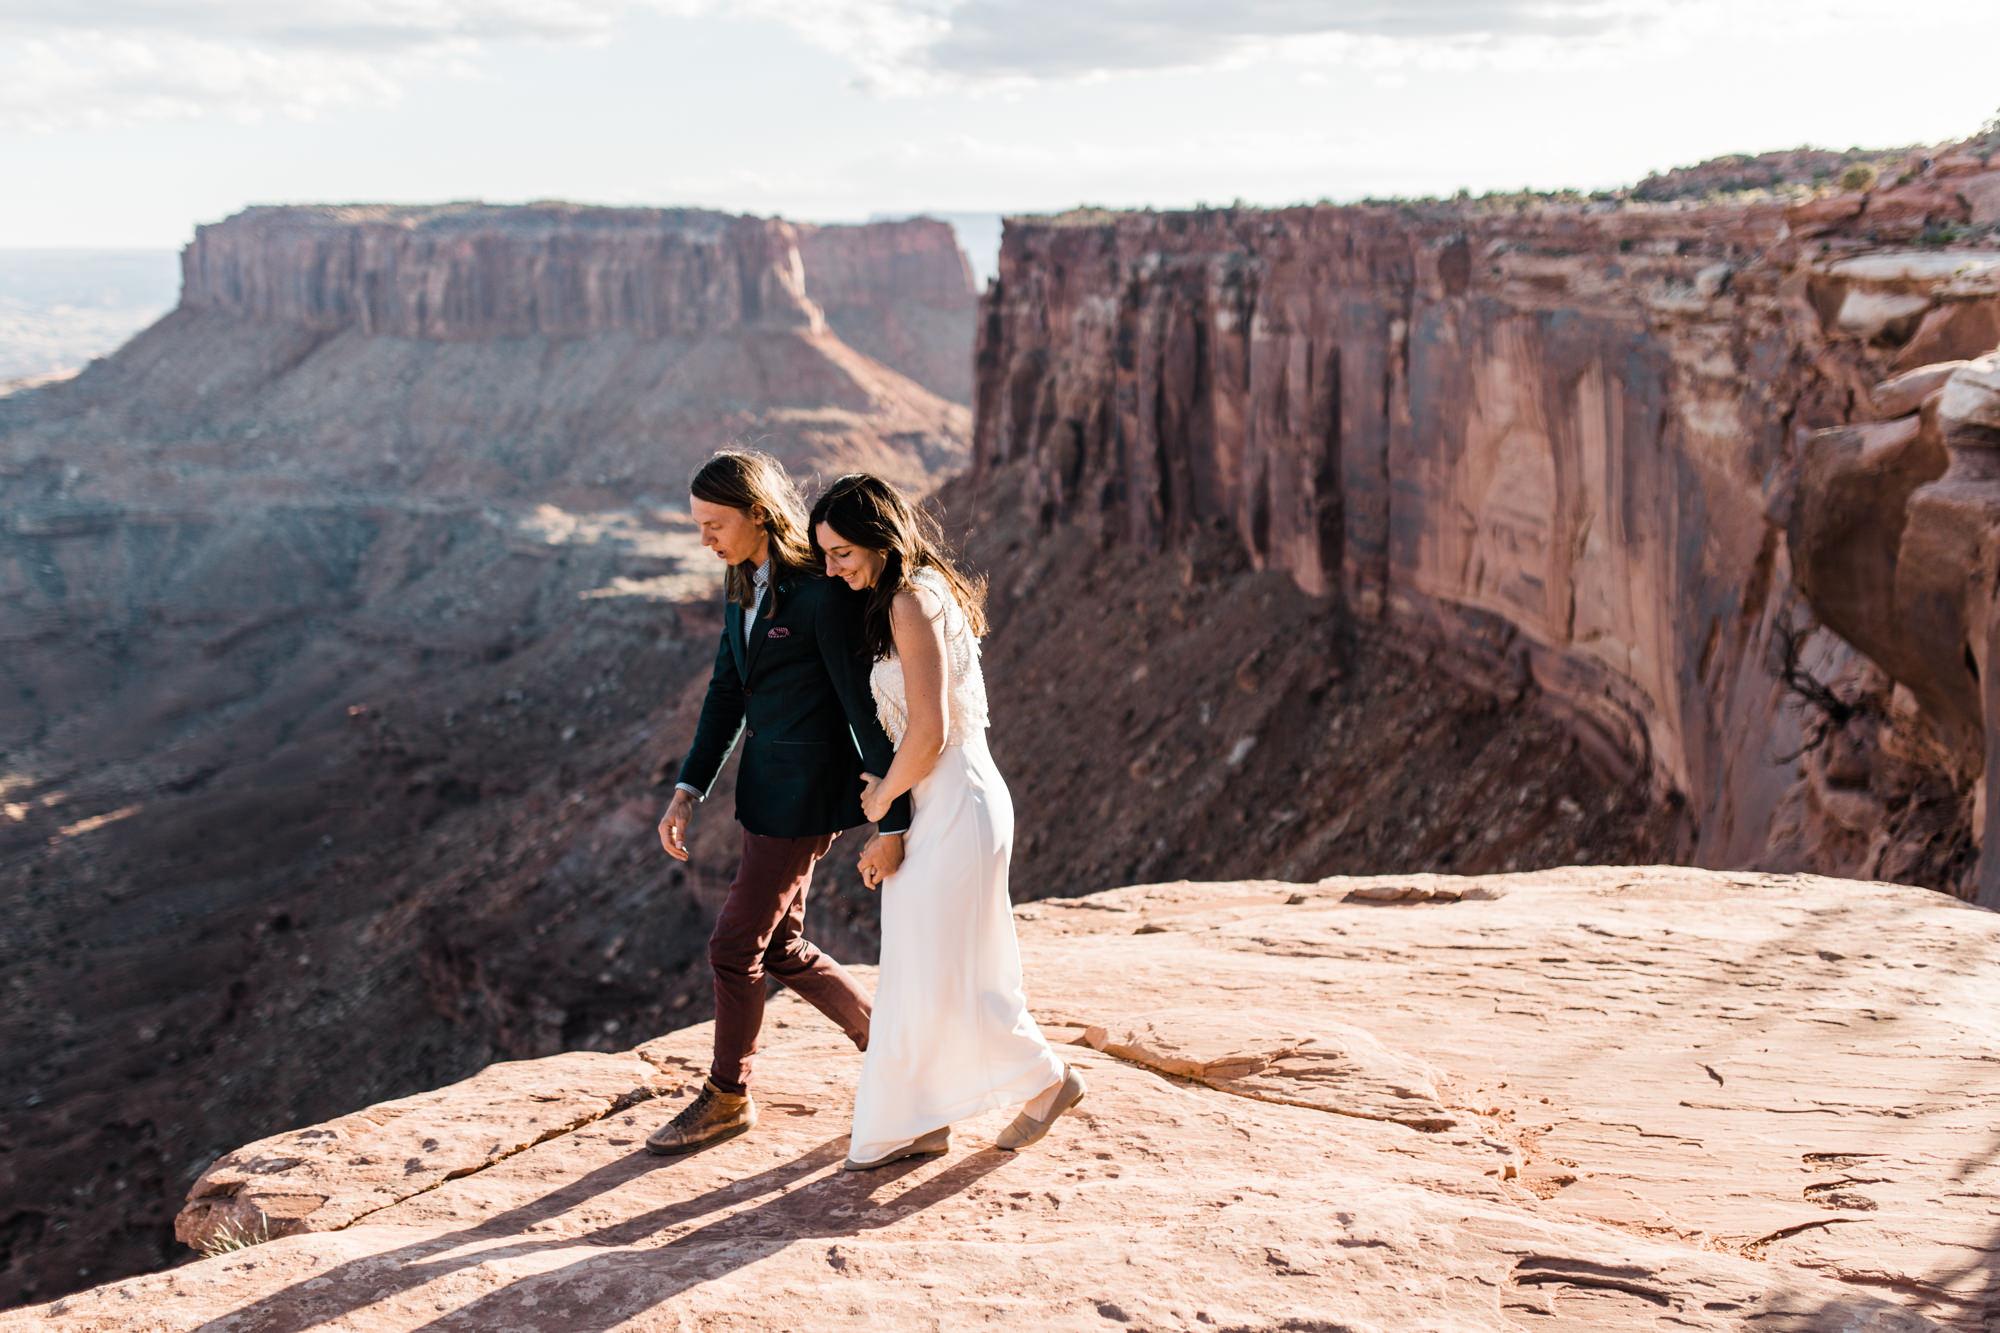 moab, utah canyonlands national park wedding | destination adventure wedding photographers | the hearnes adventure photography | www.thehearnes.com